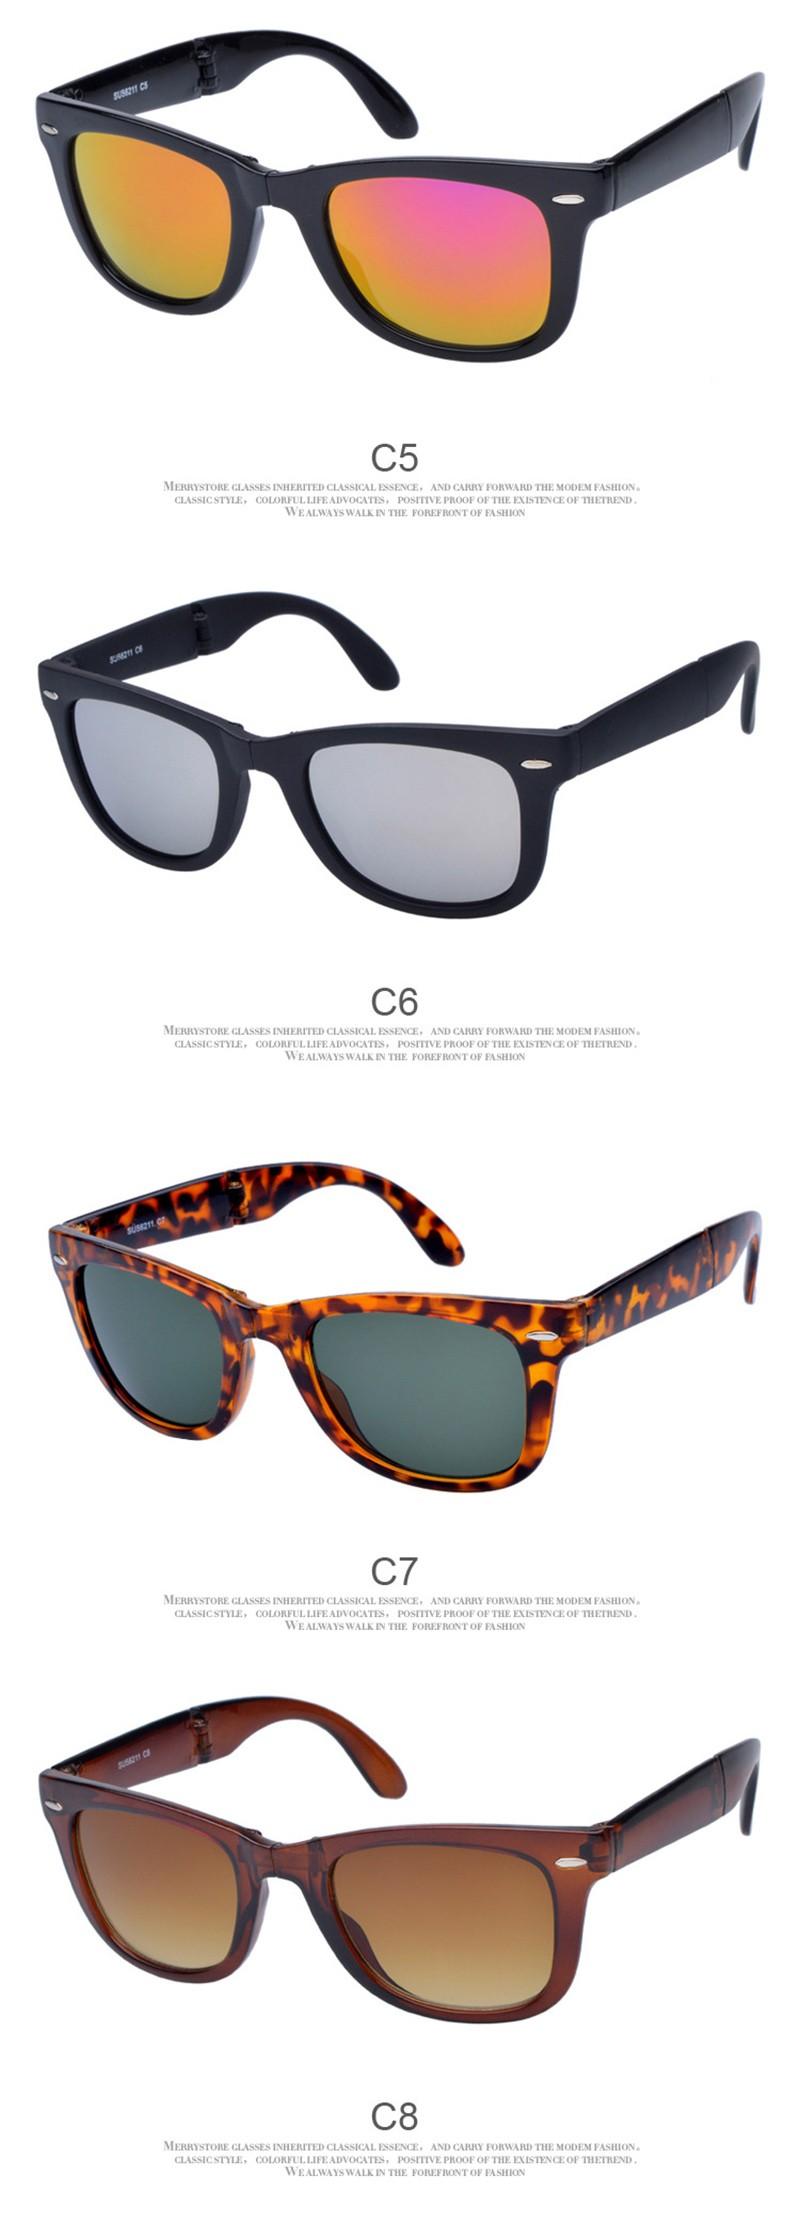 Chashma Marca Mulheres e Homens Óculos de Sol Design de Moda ... 326b423452